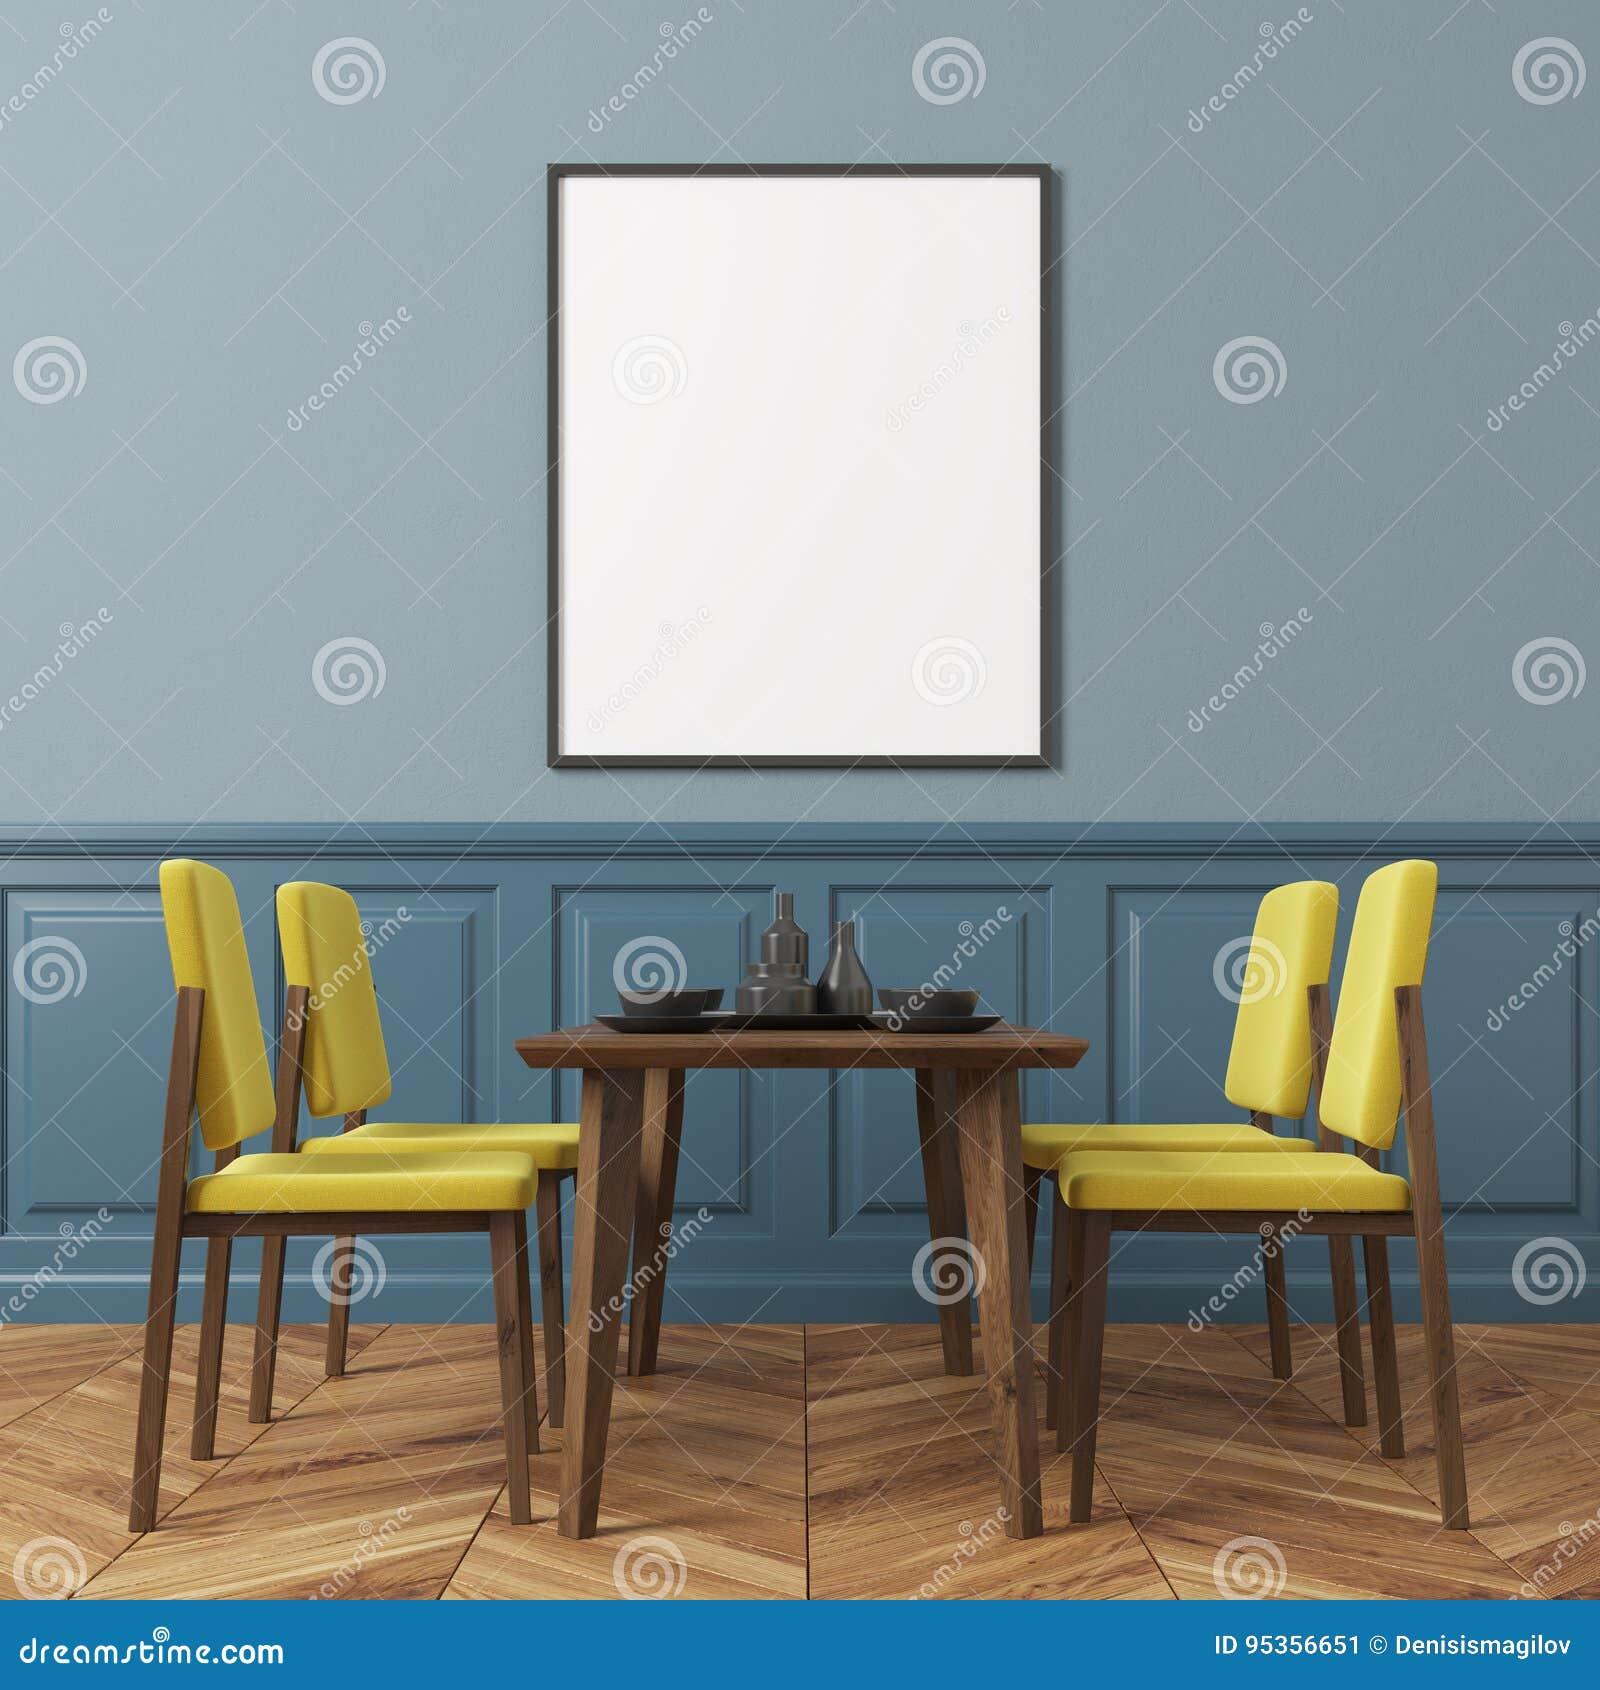 Salle A Manger De Mur Bleu Chaises Jaunes Illustration Stock